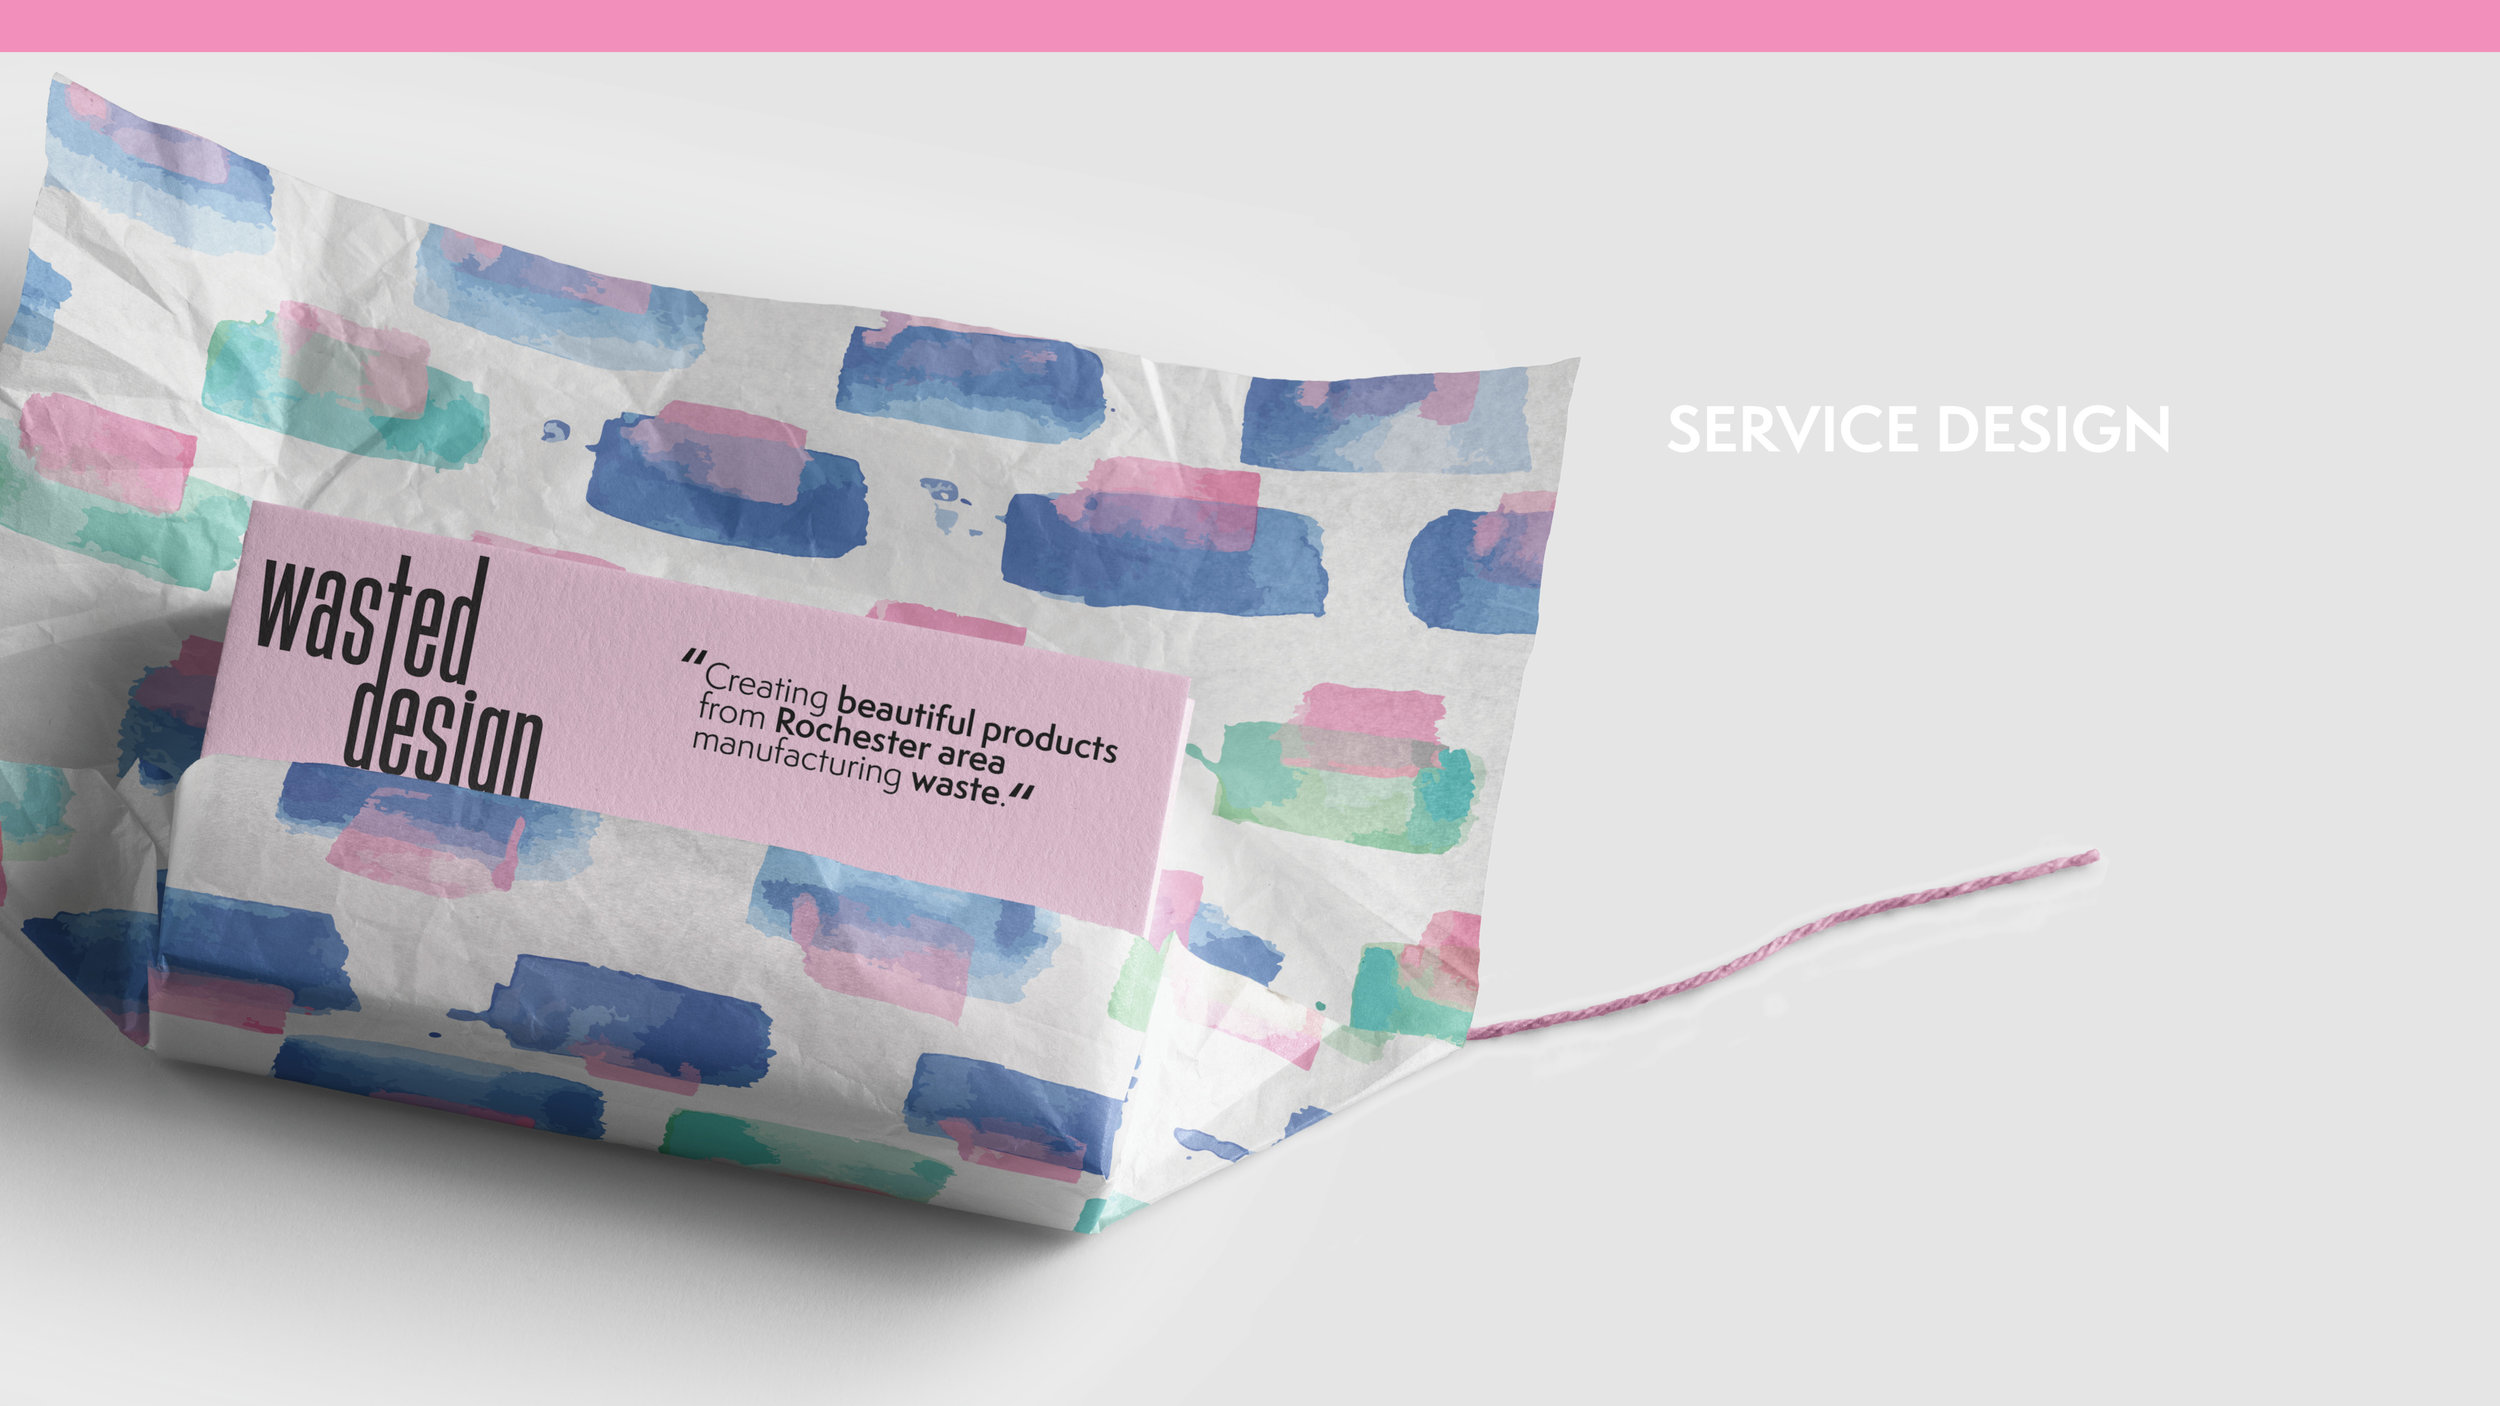 servicedesign_coverphoto.jpg